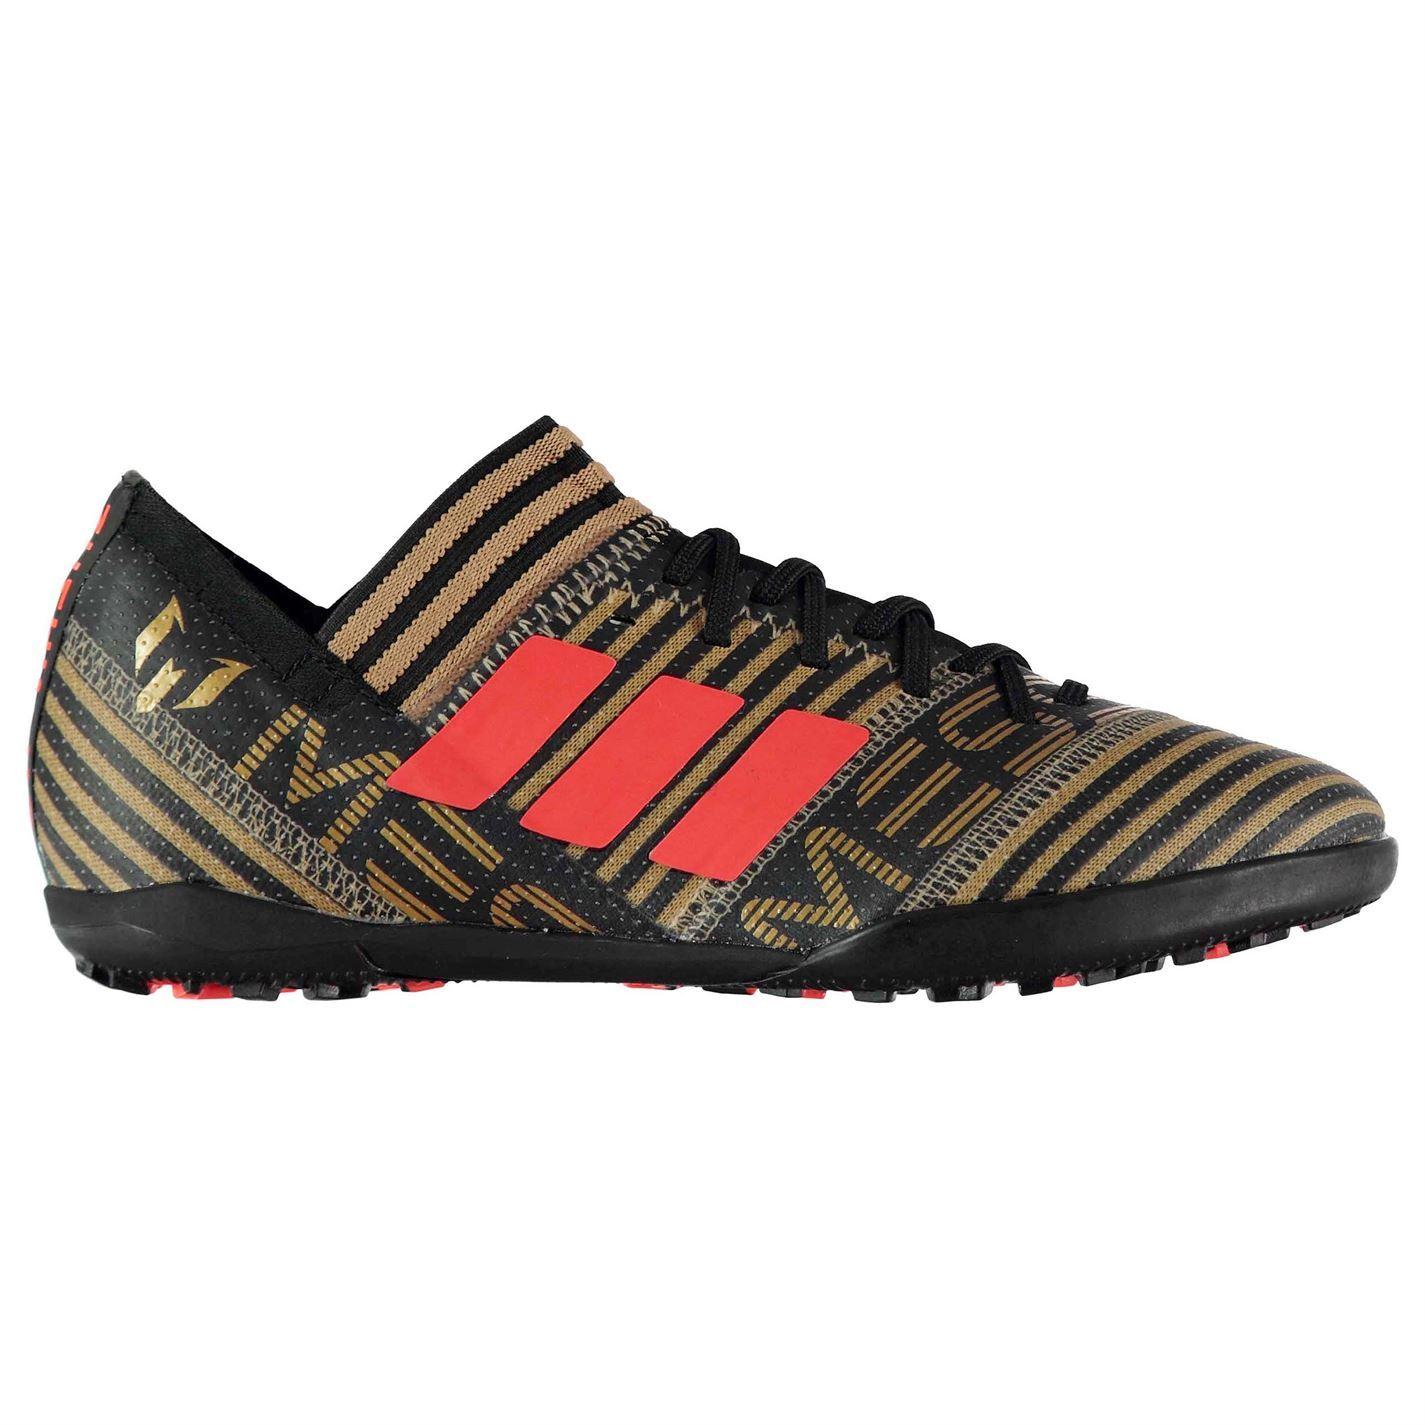 d9e273d6b adidas Kids Nemeziz Messi Tango 17.3 Junior Astro Turf Trainers Football  Boots